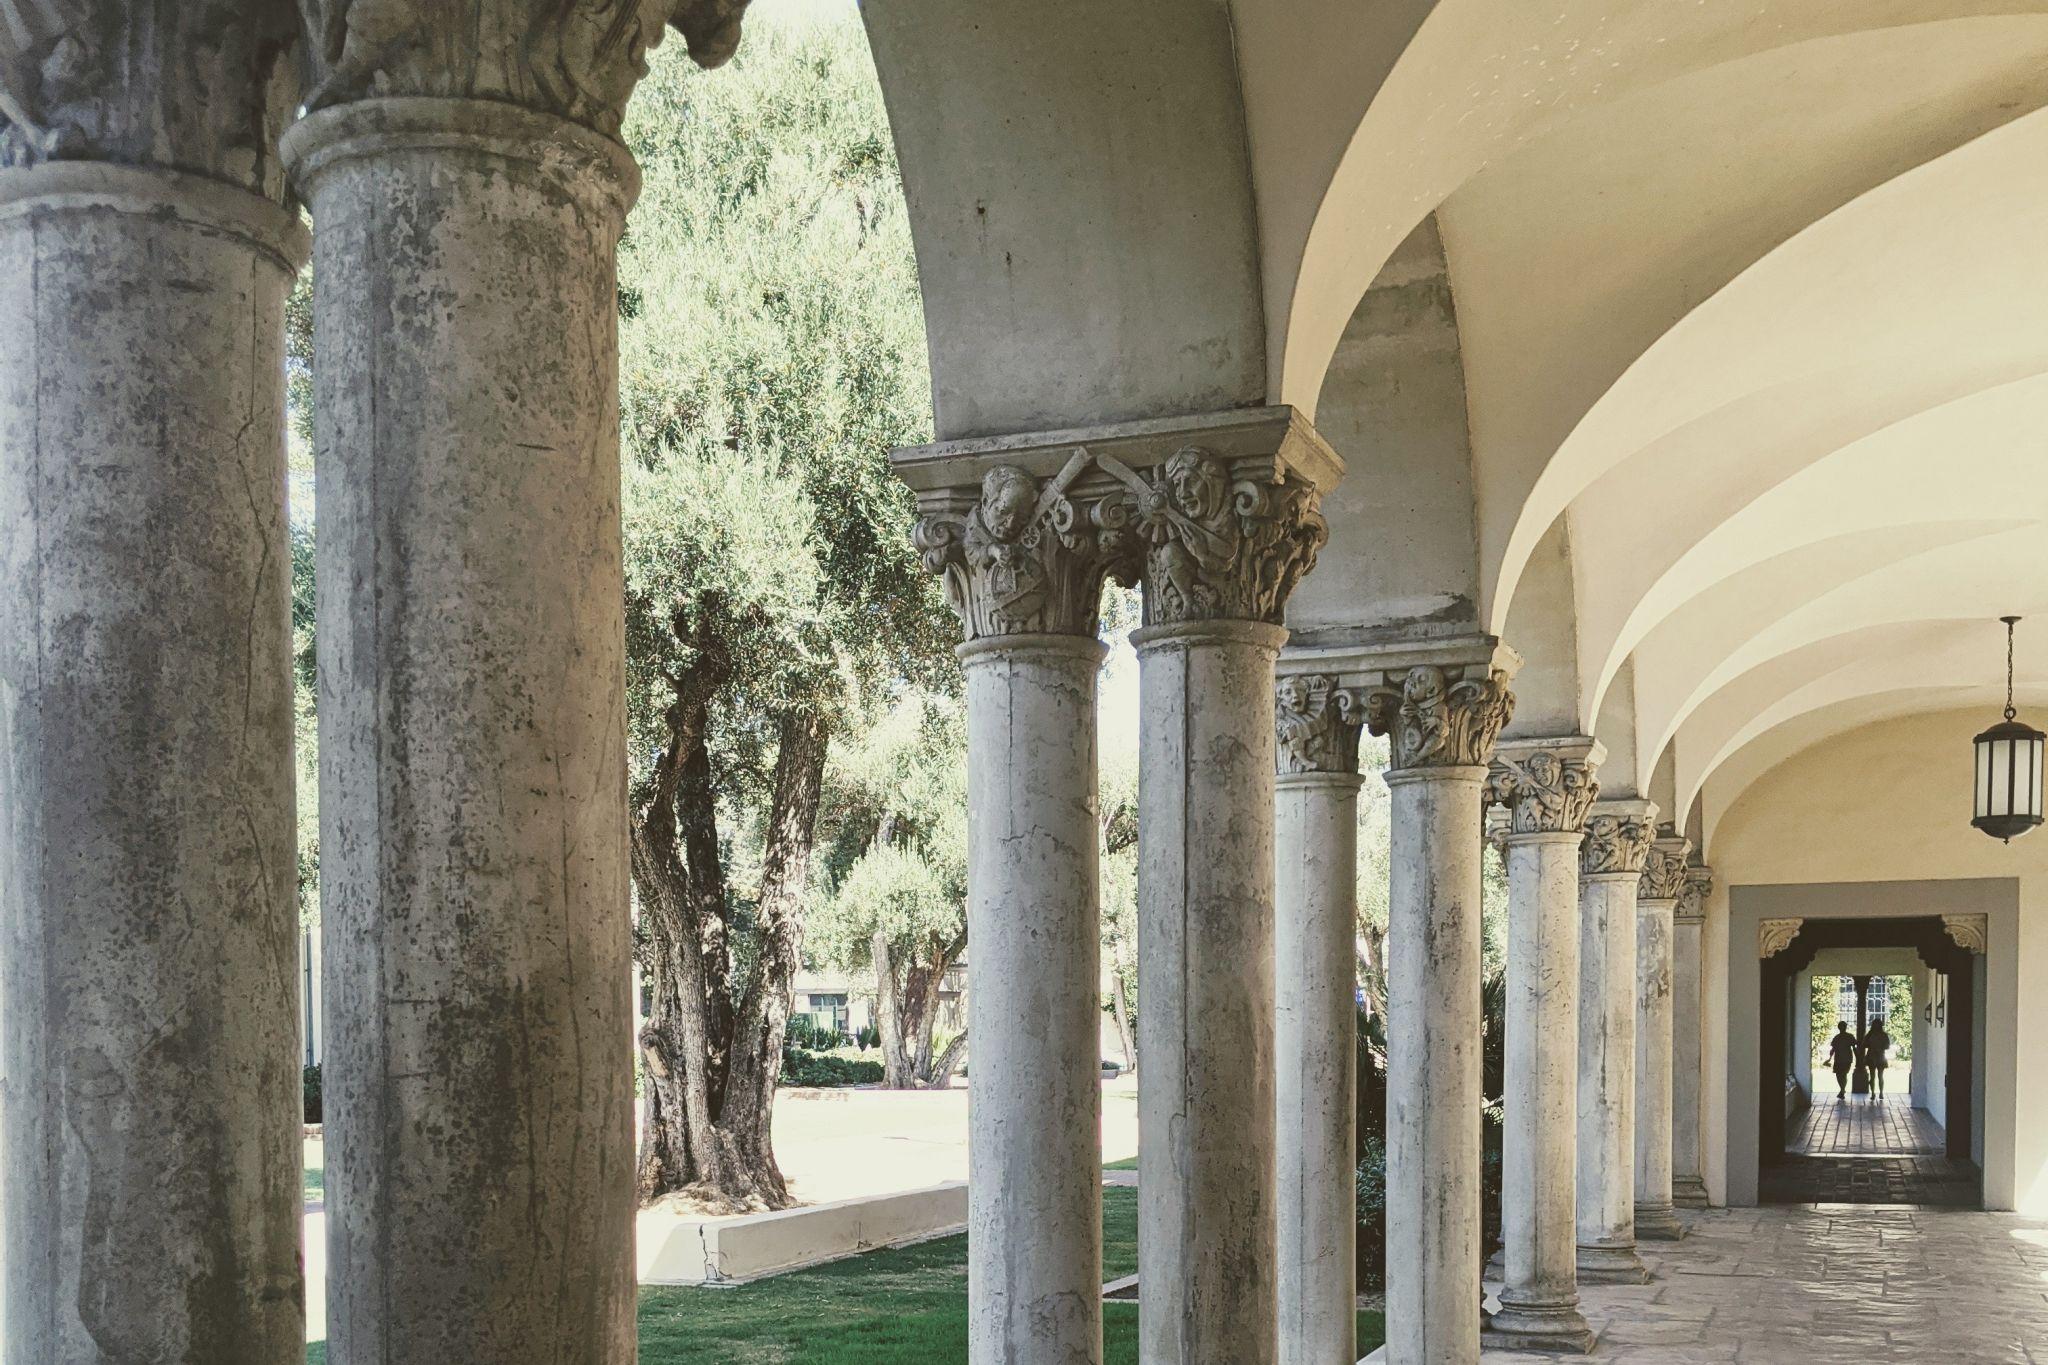 2 California schools make list of top universities in the world